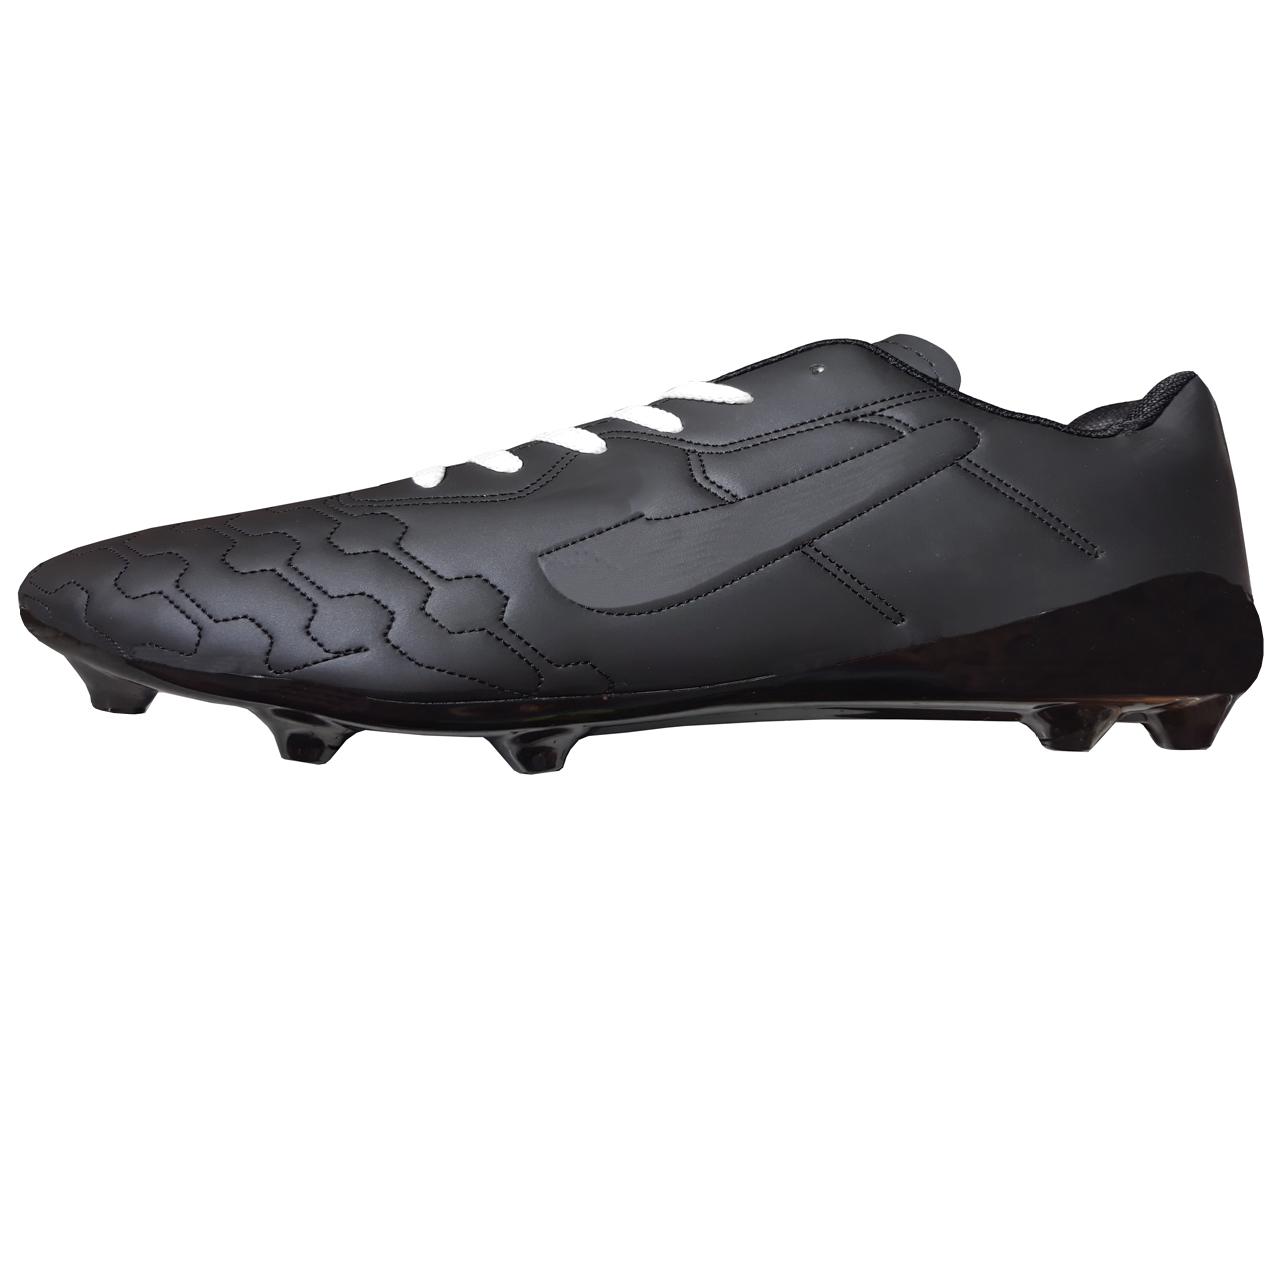 کفش فوتبال مردانه مدل SP230